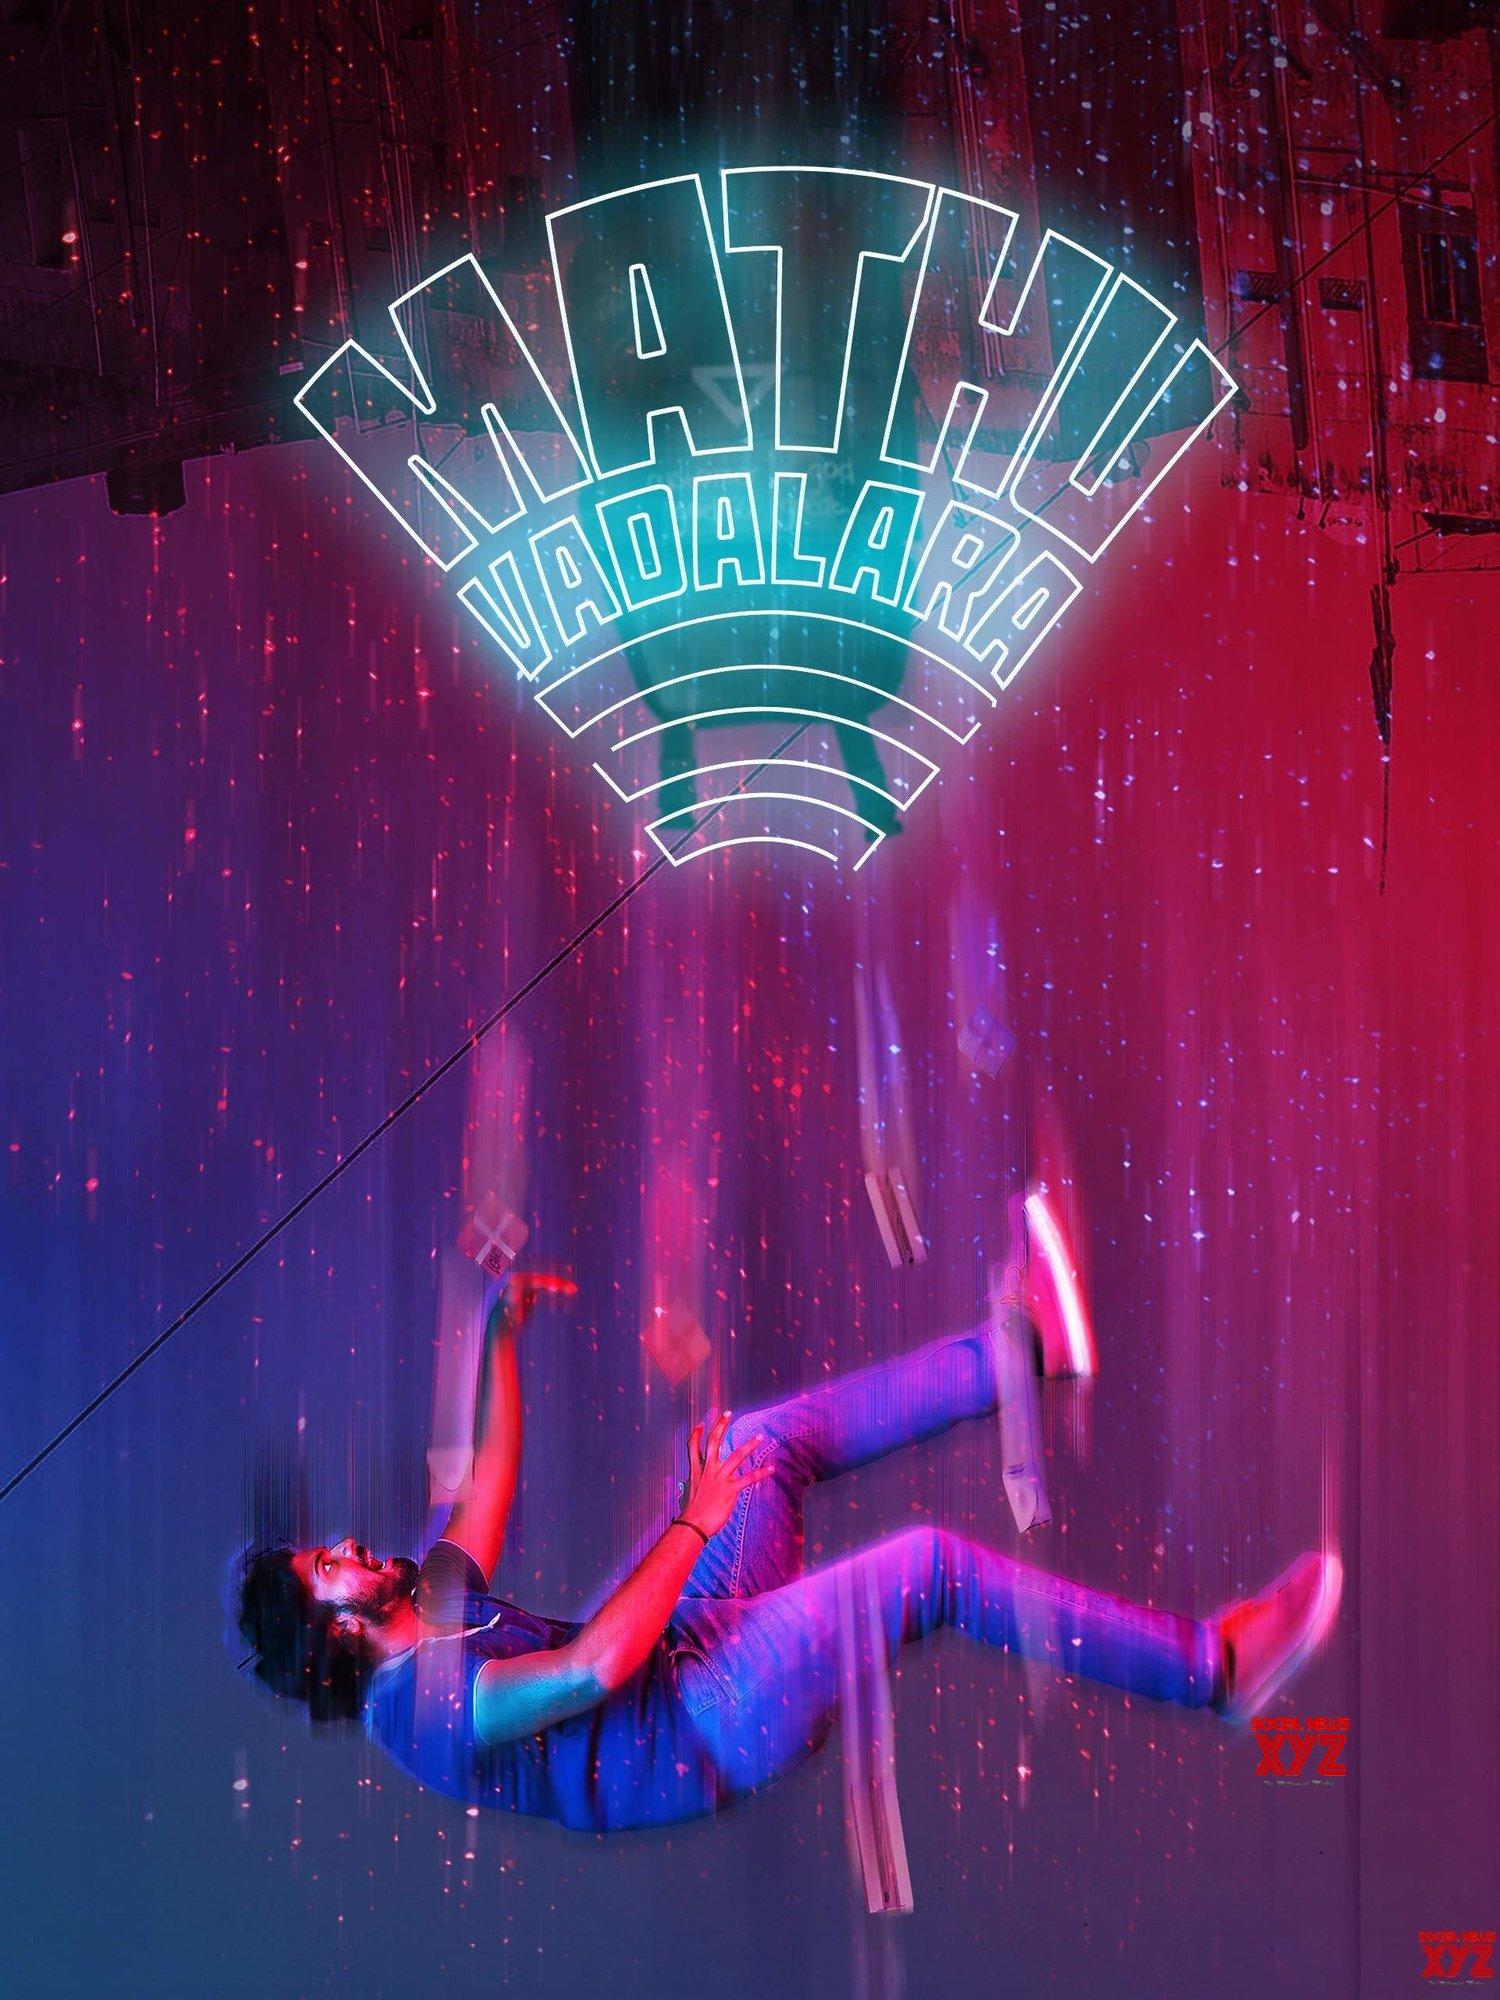 Mathu Vadalara Movie Is Now Streaming On Amazon Prime Video